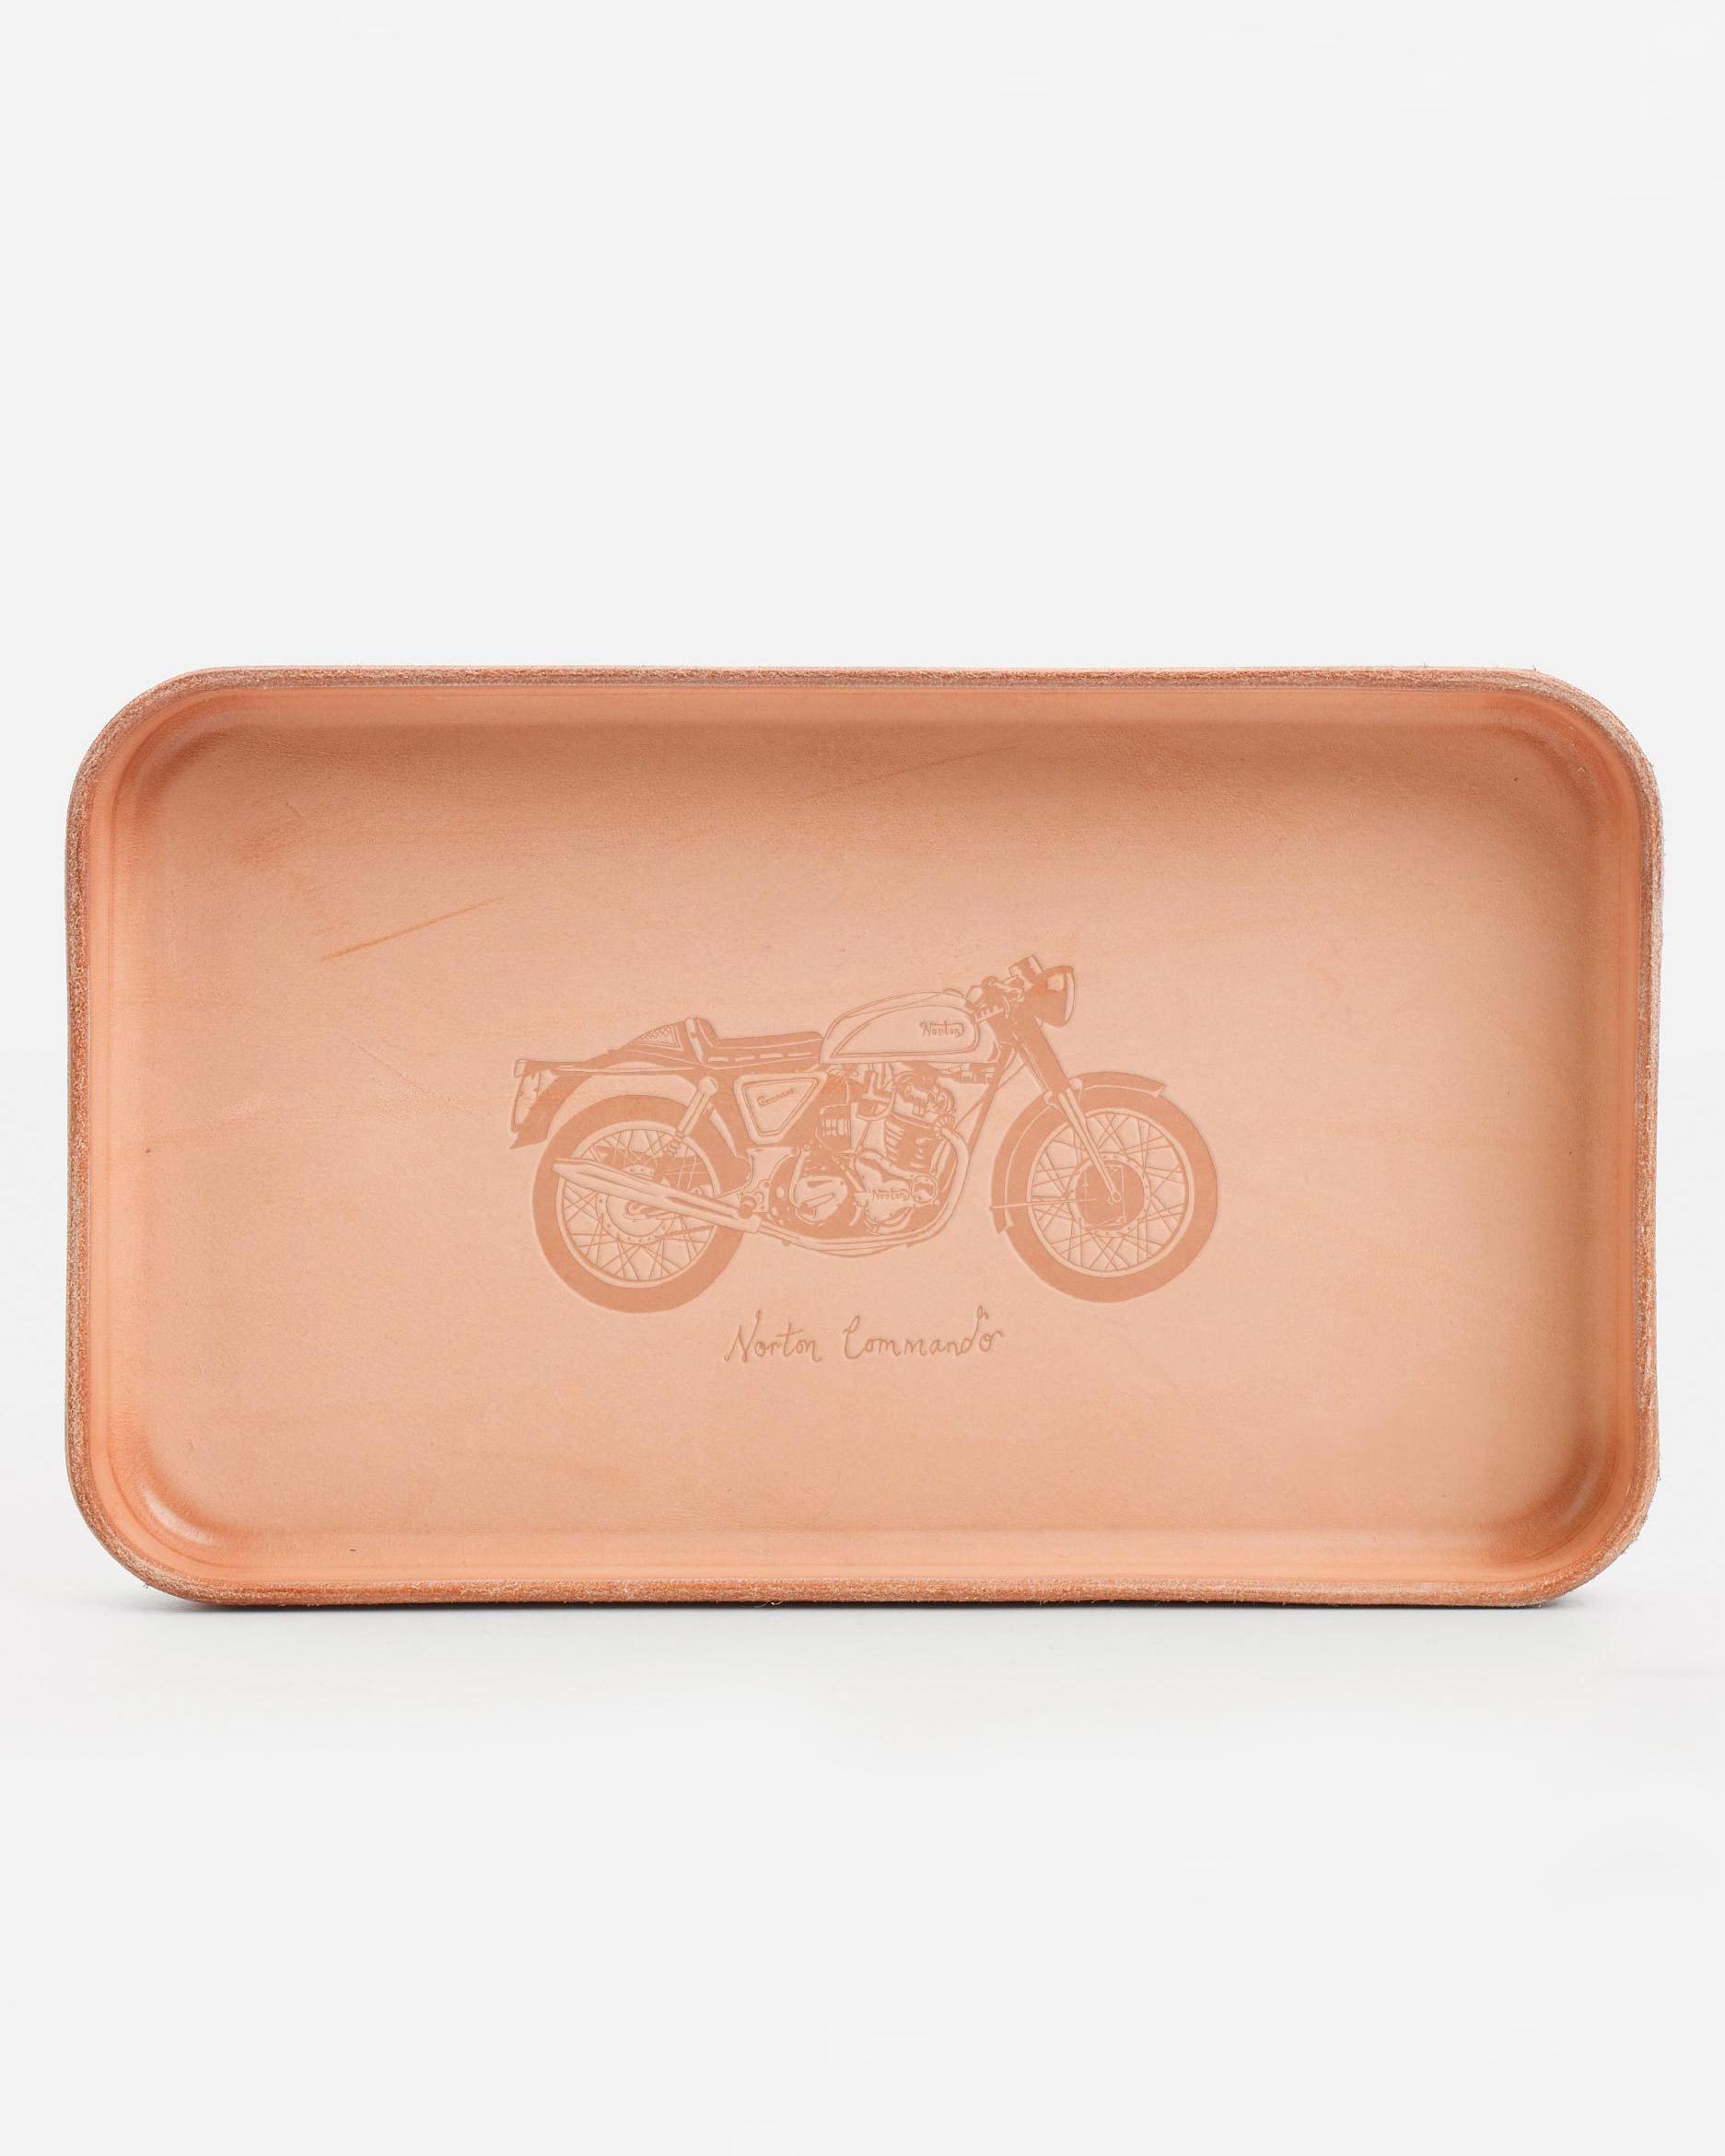 billykirk leather valet tray